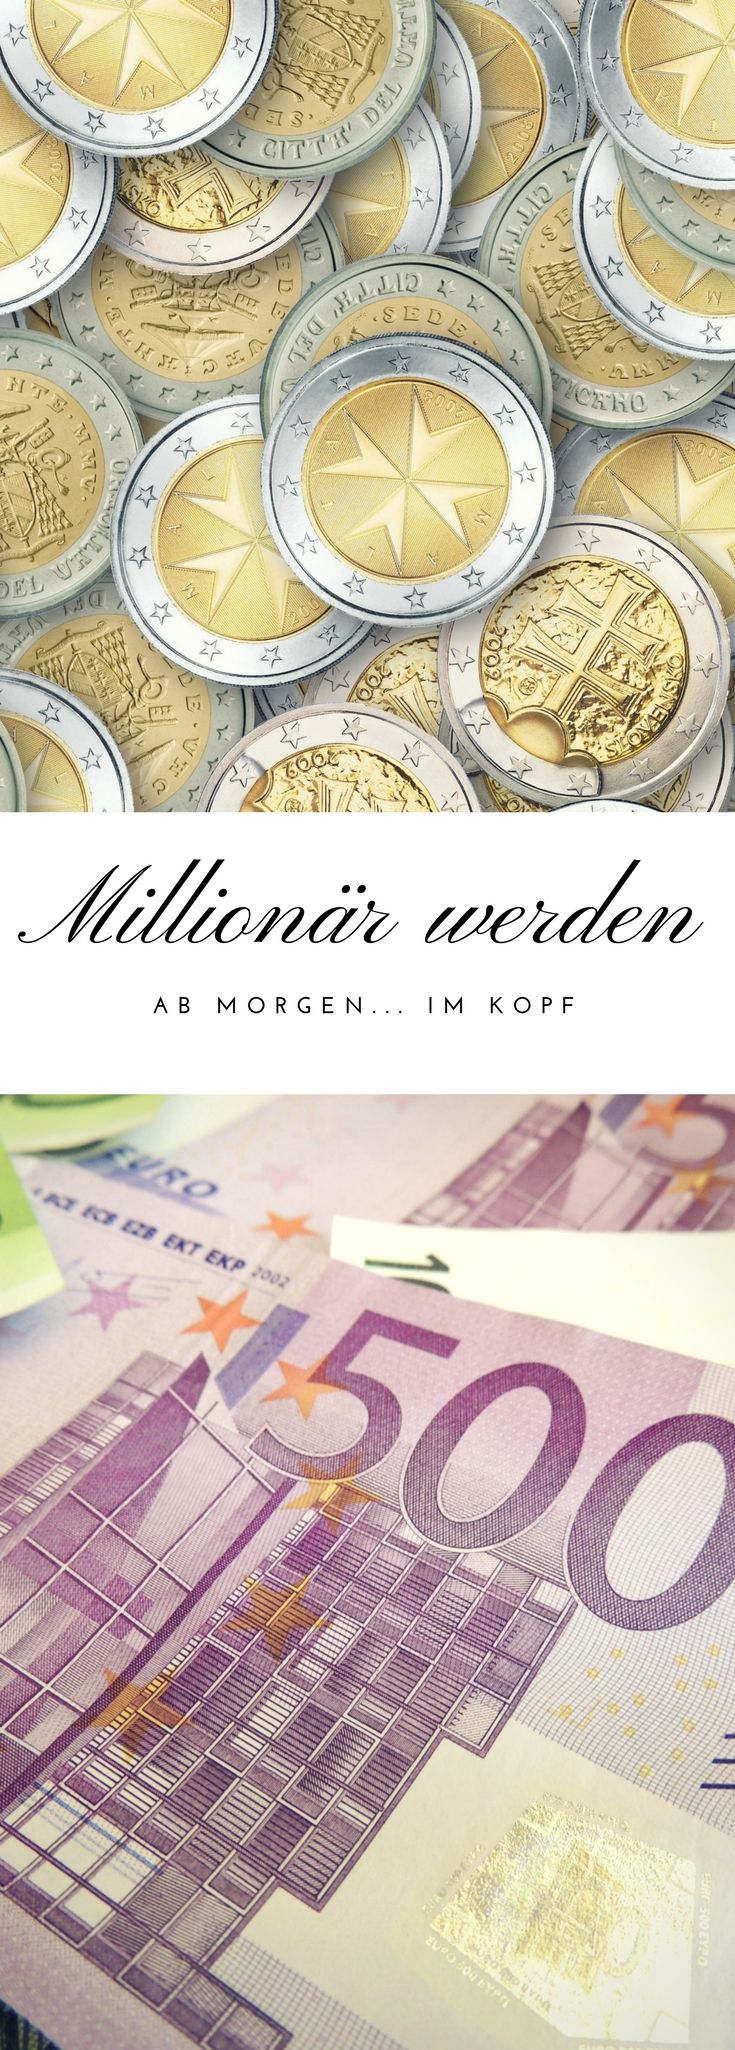 Millionär werden ab morgen – im Kopf – Technik-Finanzen.de | Blog